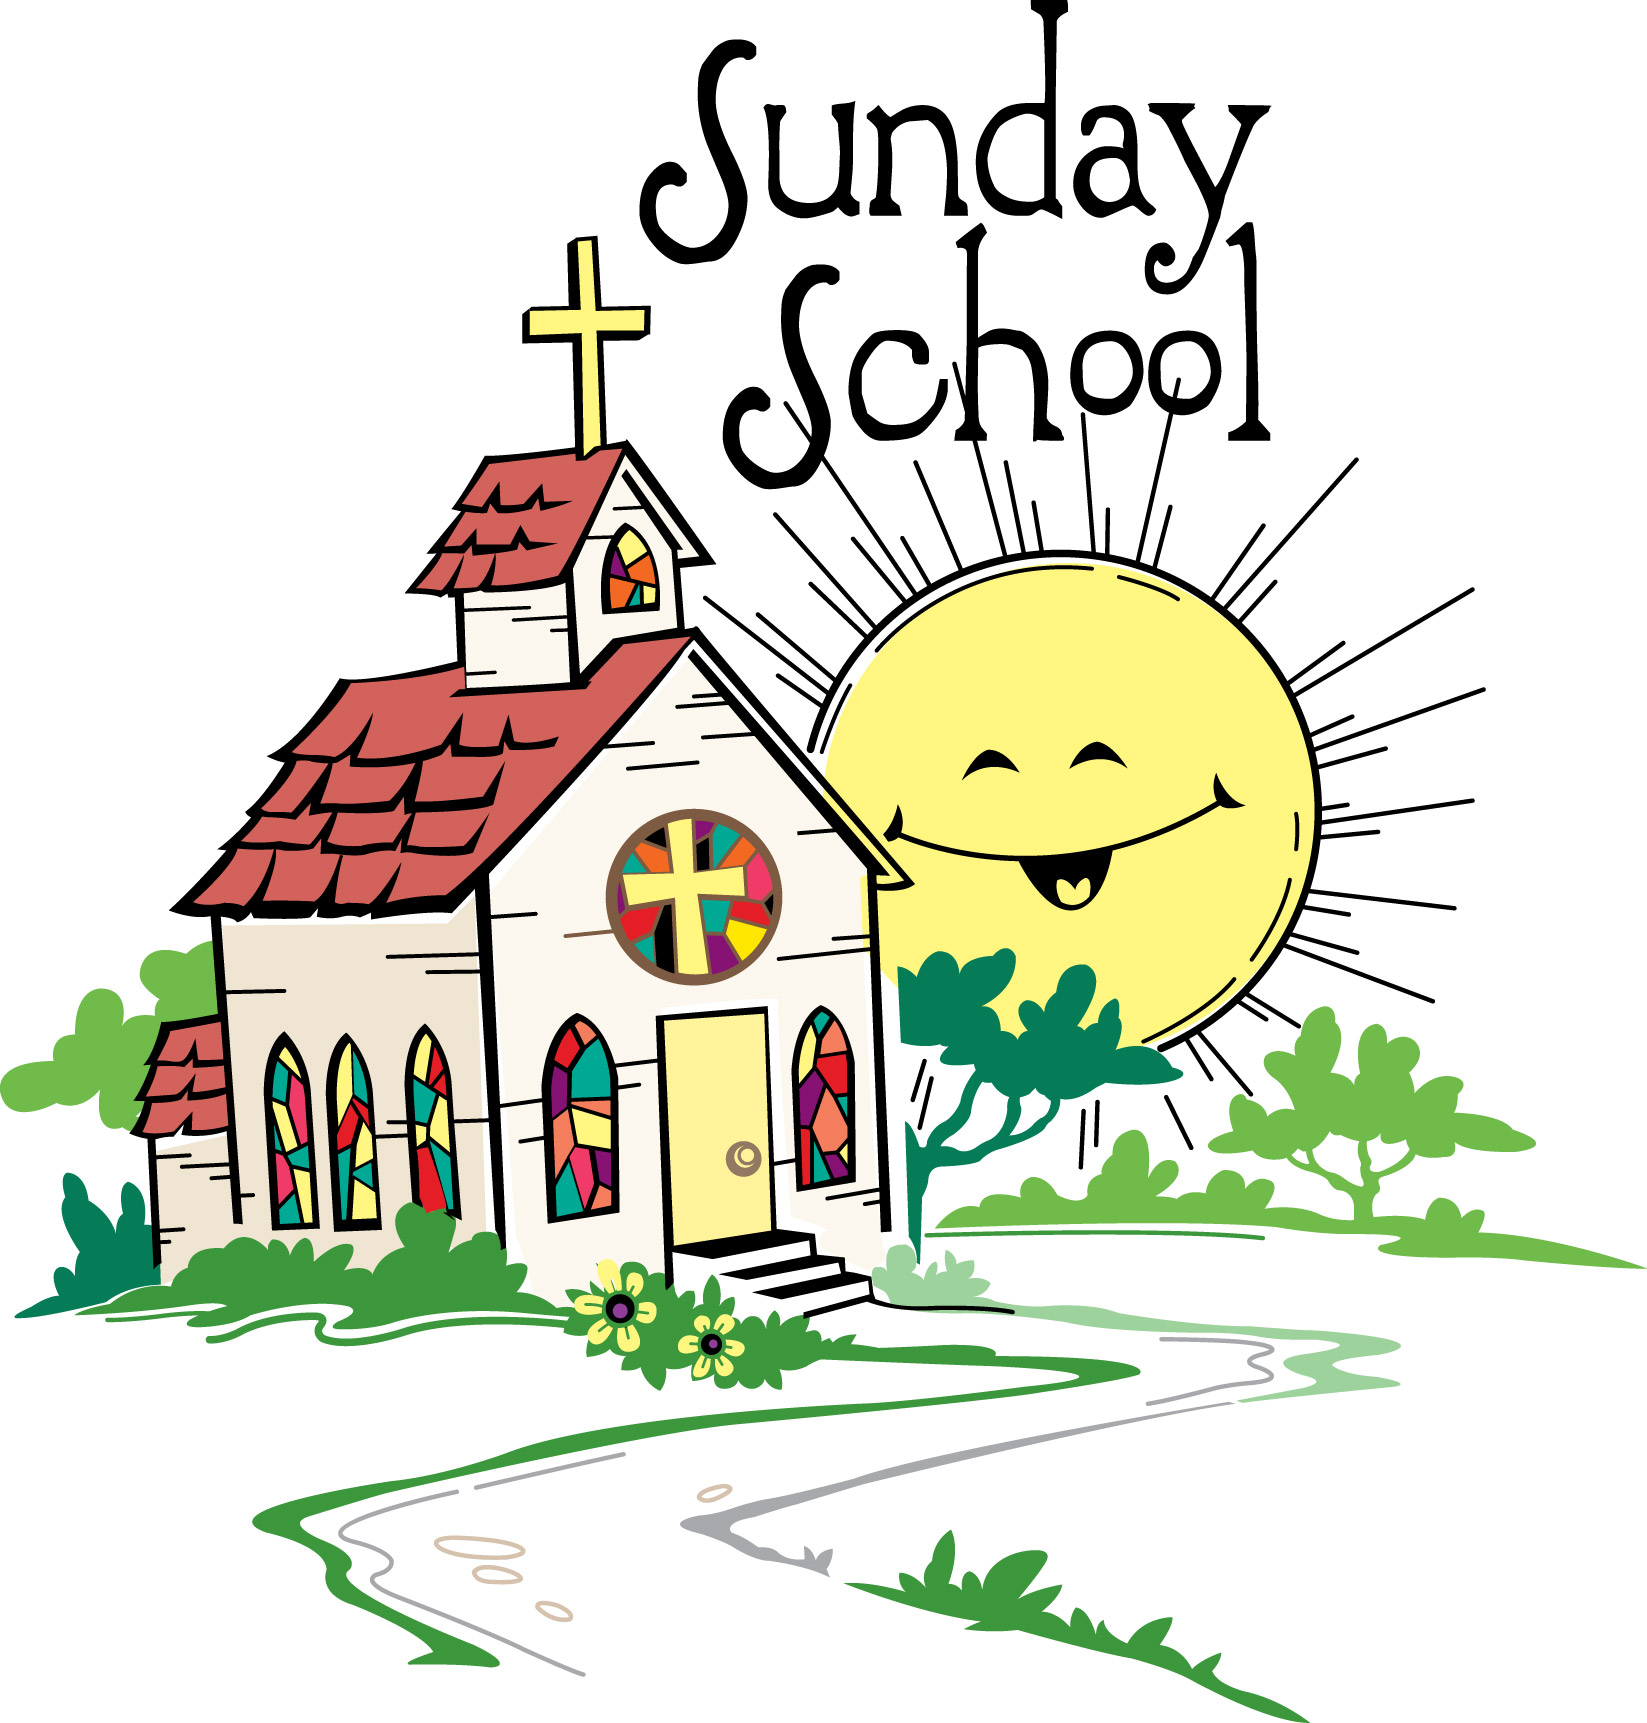 Sunday School Clip Art Clipart Panda